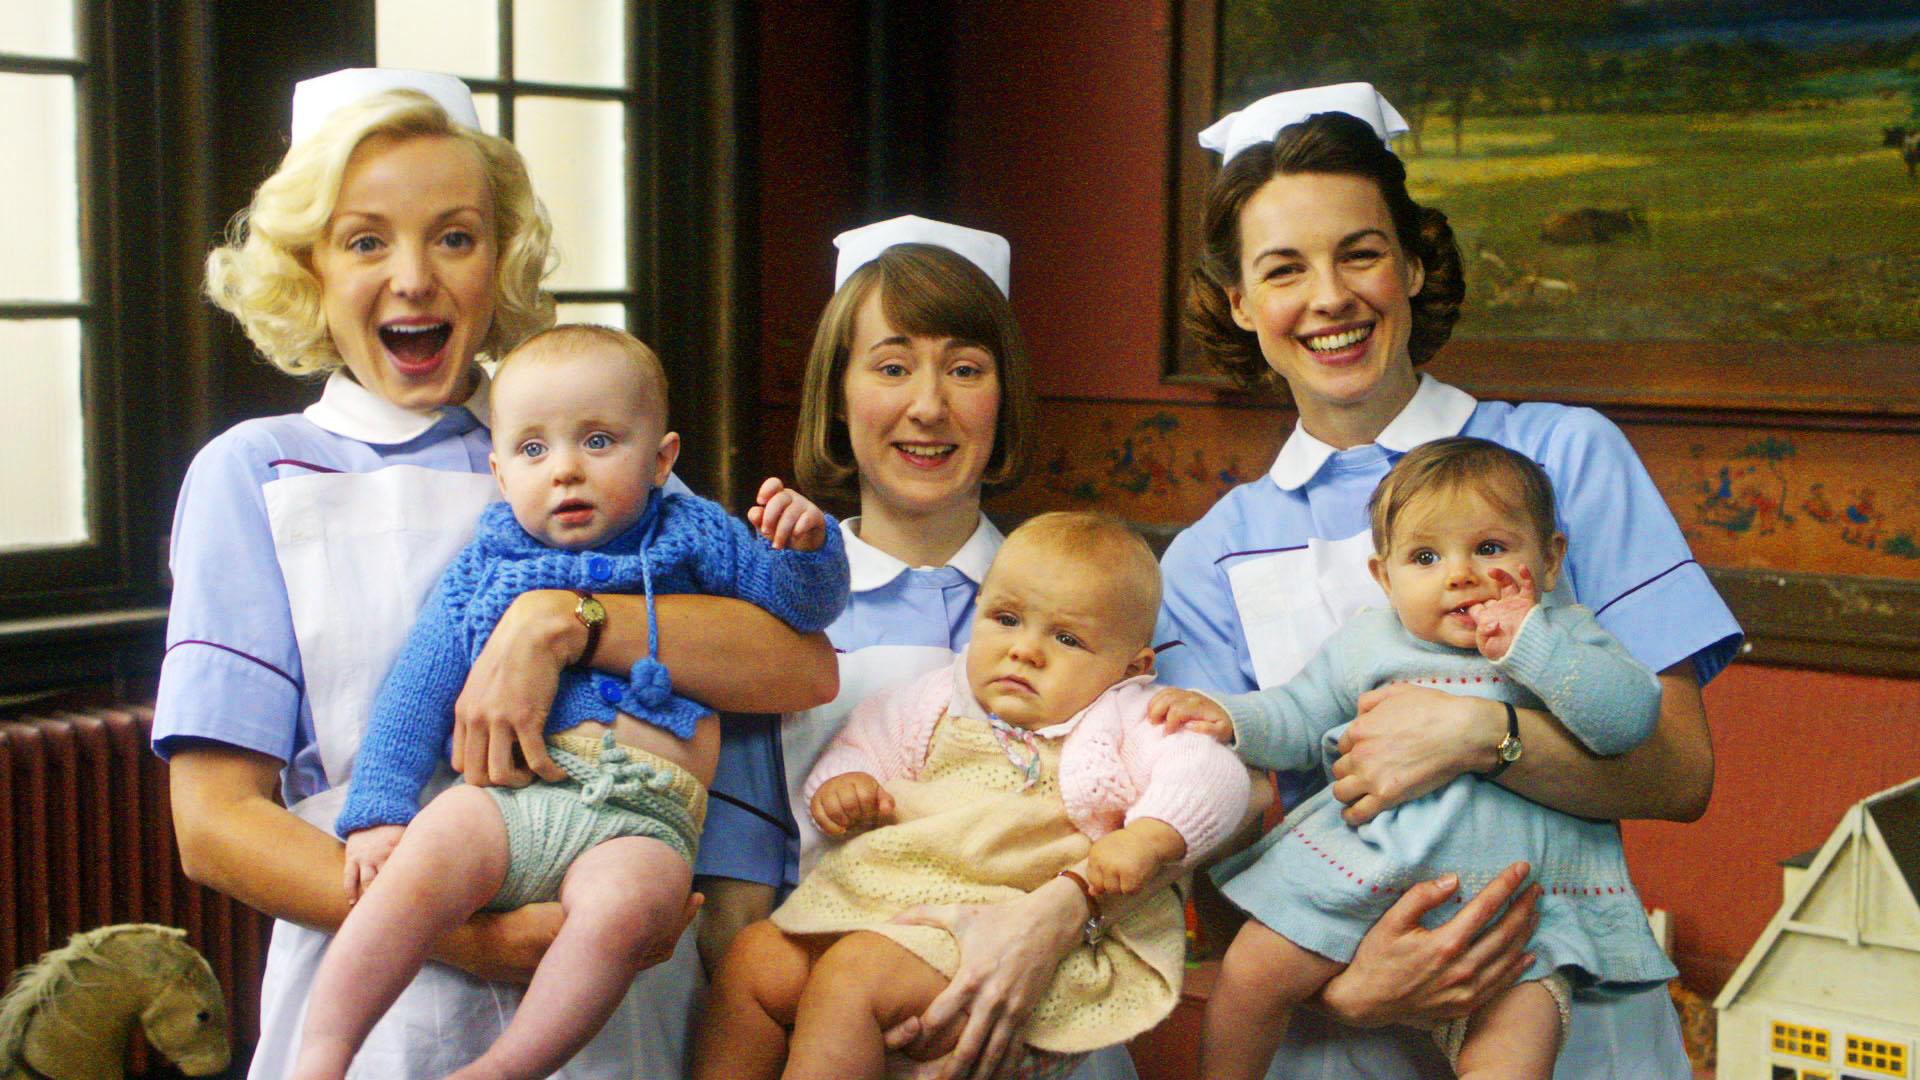 LITERATURVERFILMUNG:<br/>Call the Midwife / Staffel 2